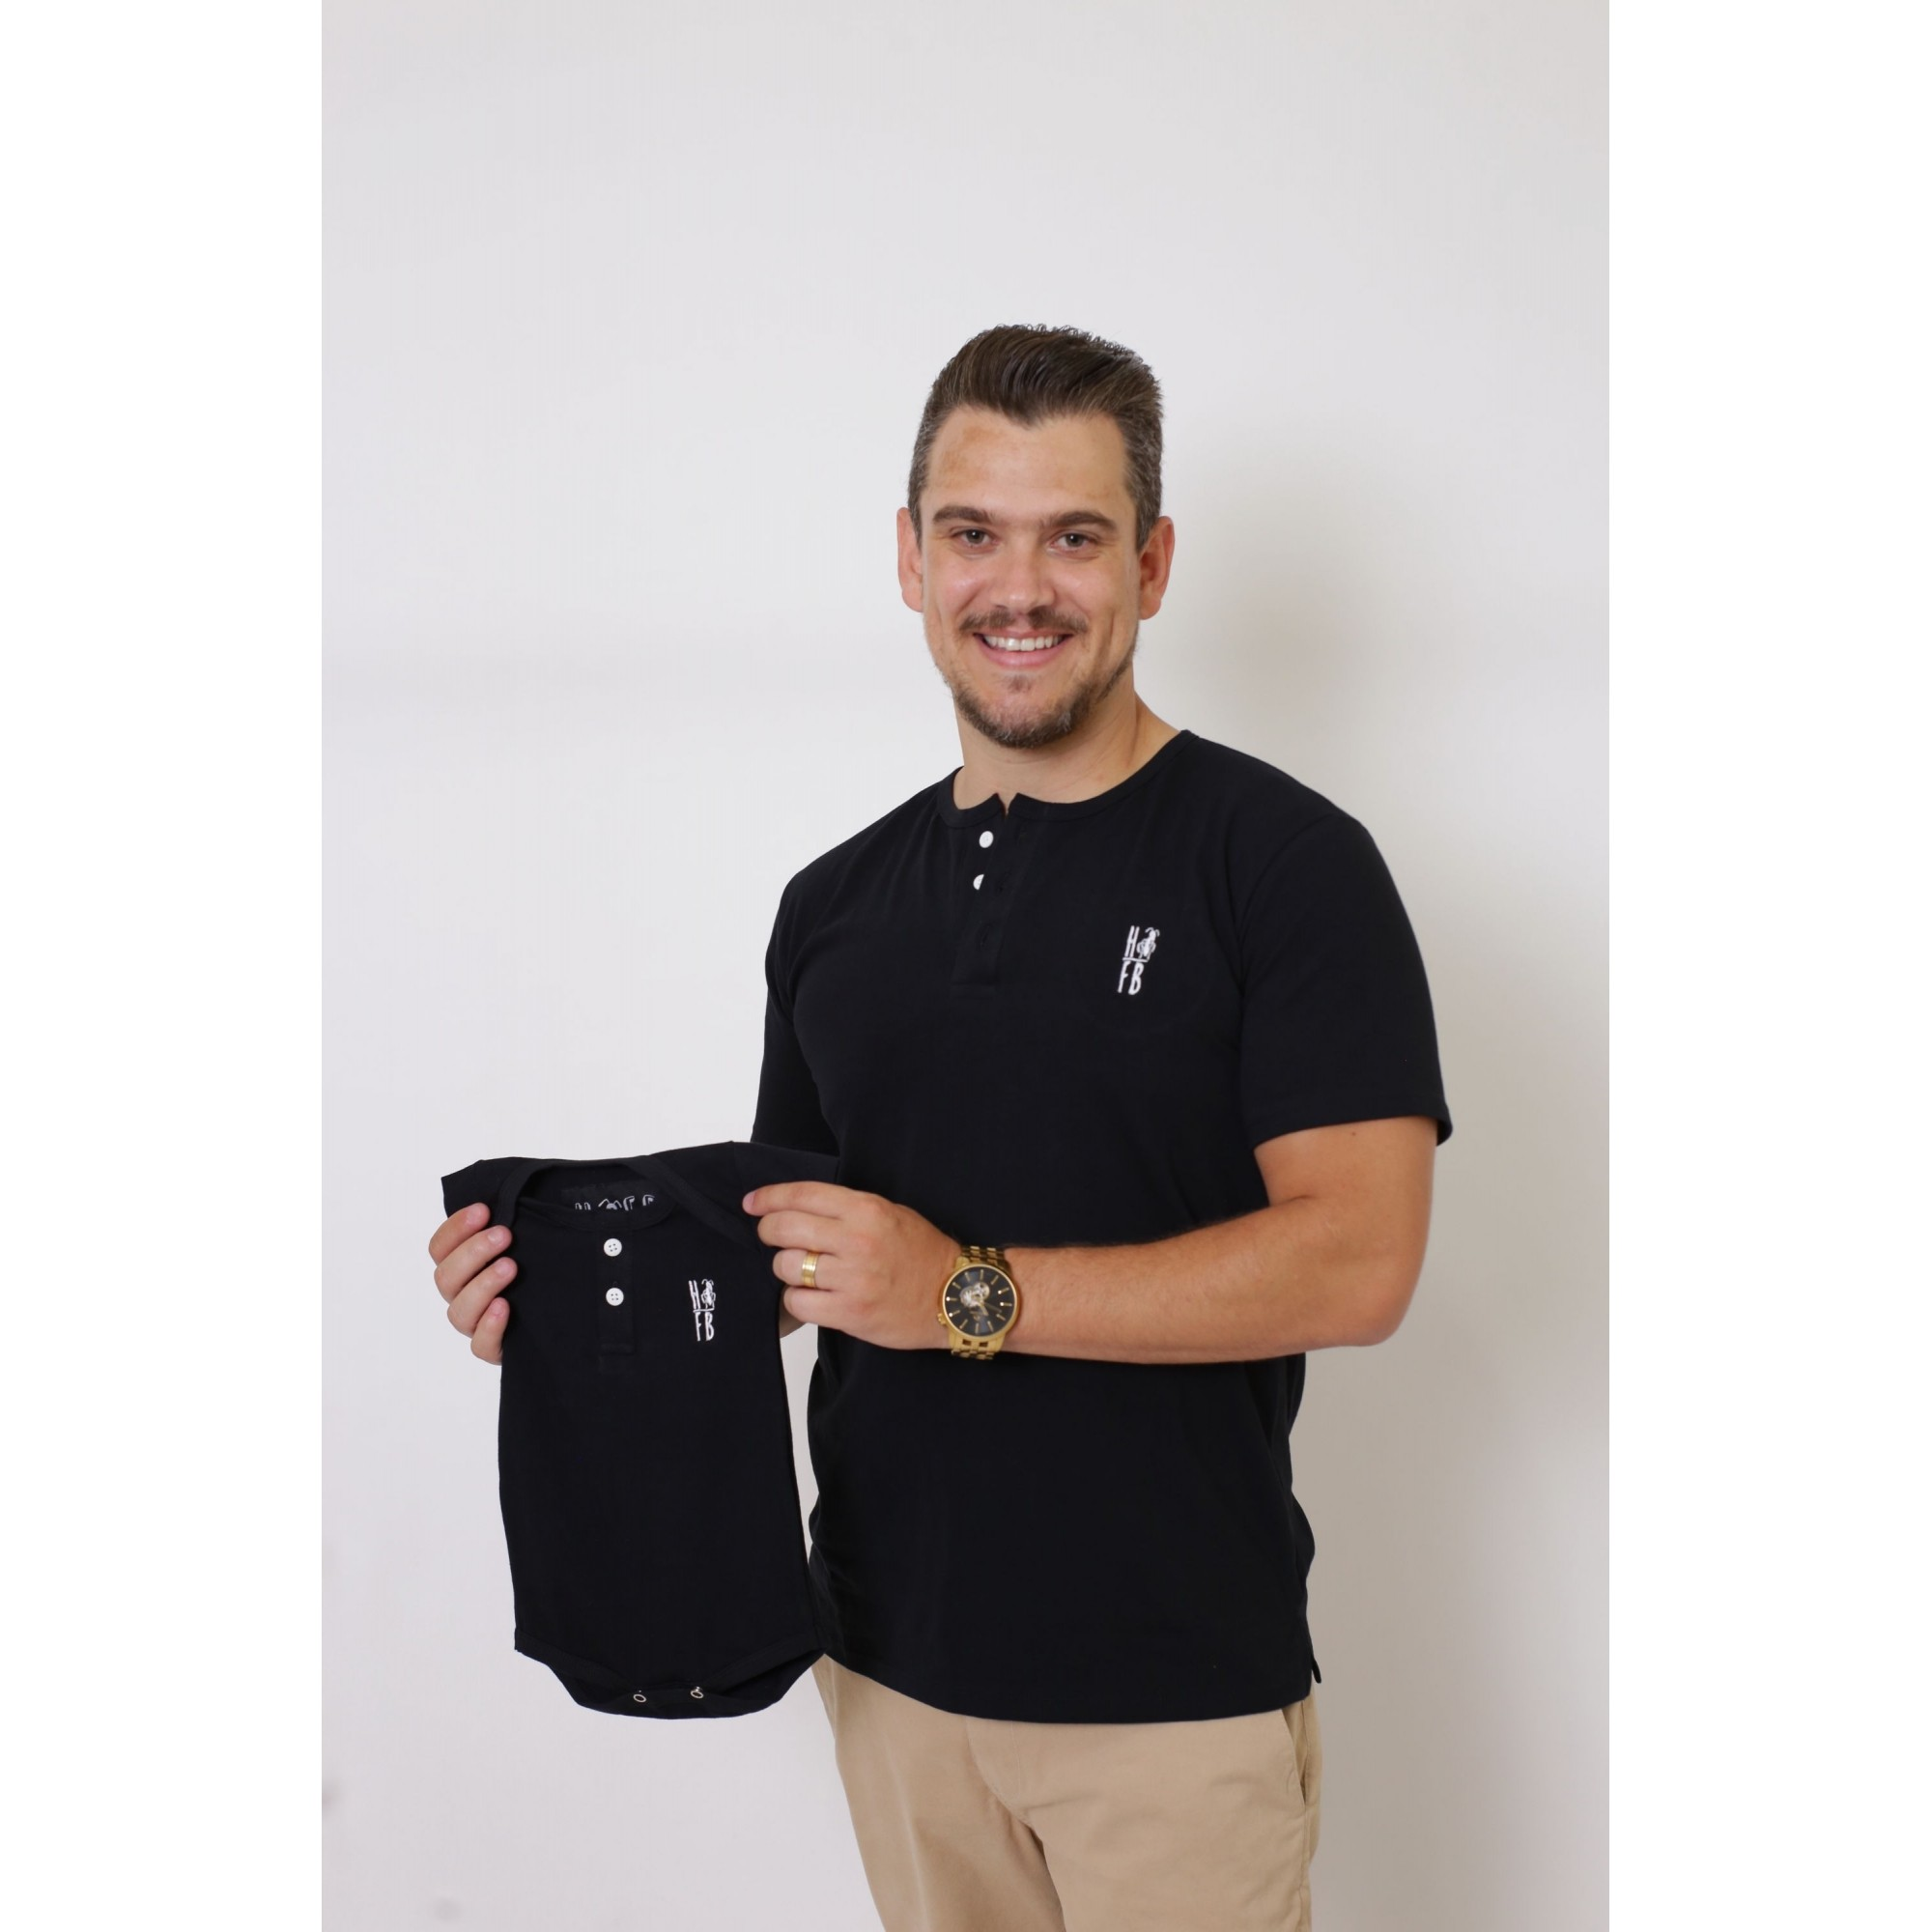 PAI E FILHA > 02 T-Shirts ou Body Henley - Preto  [Coleção Tal Pai Tal Filha]  - Heitor Fashion Brazil